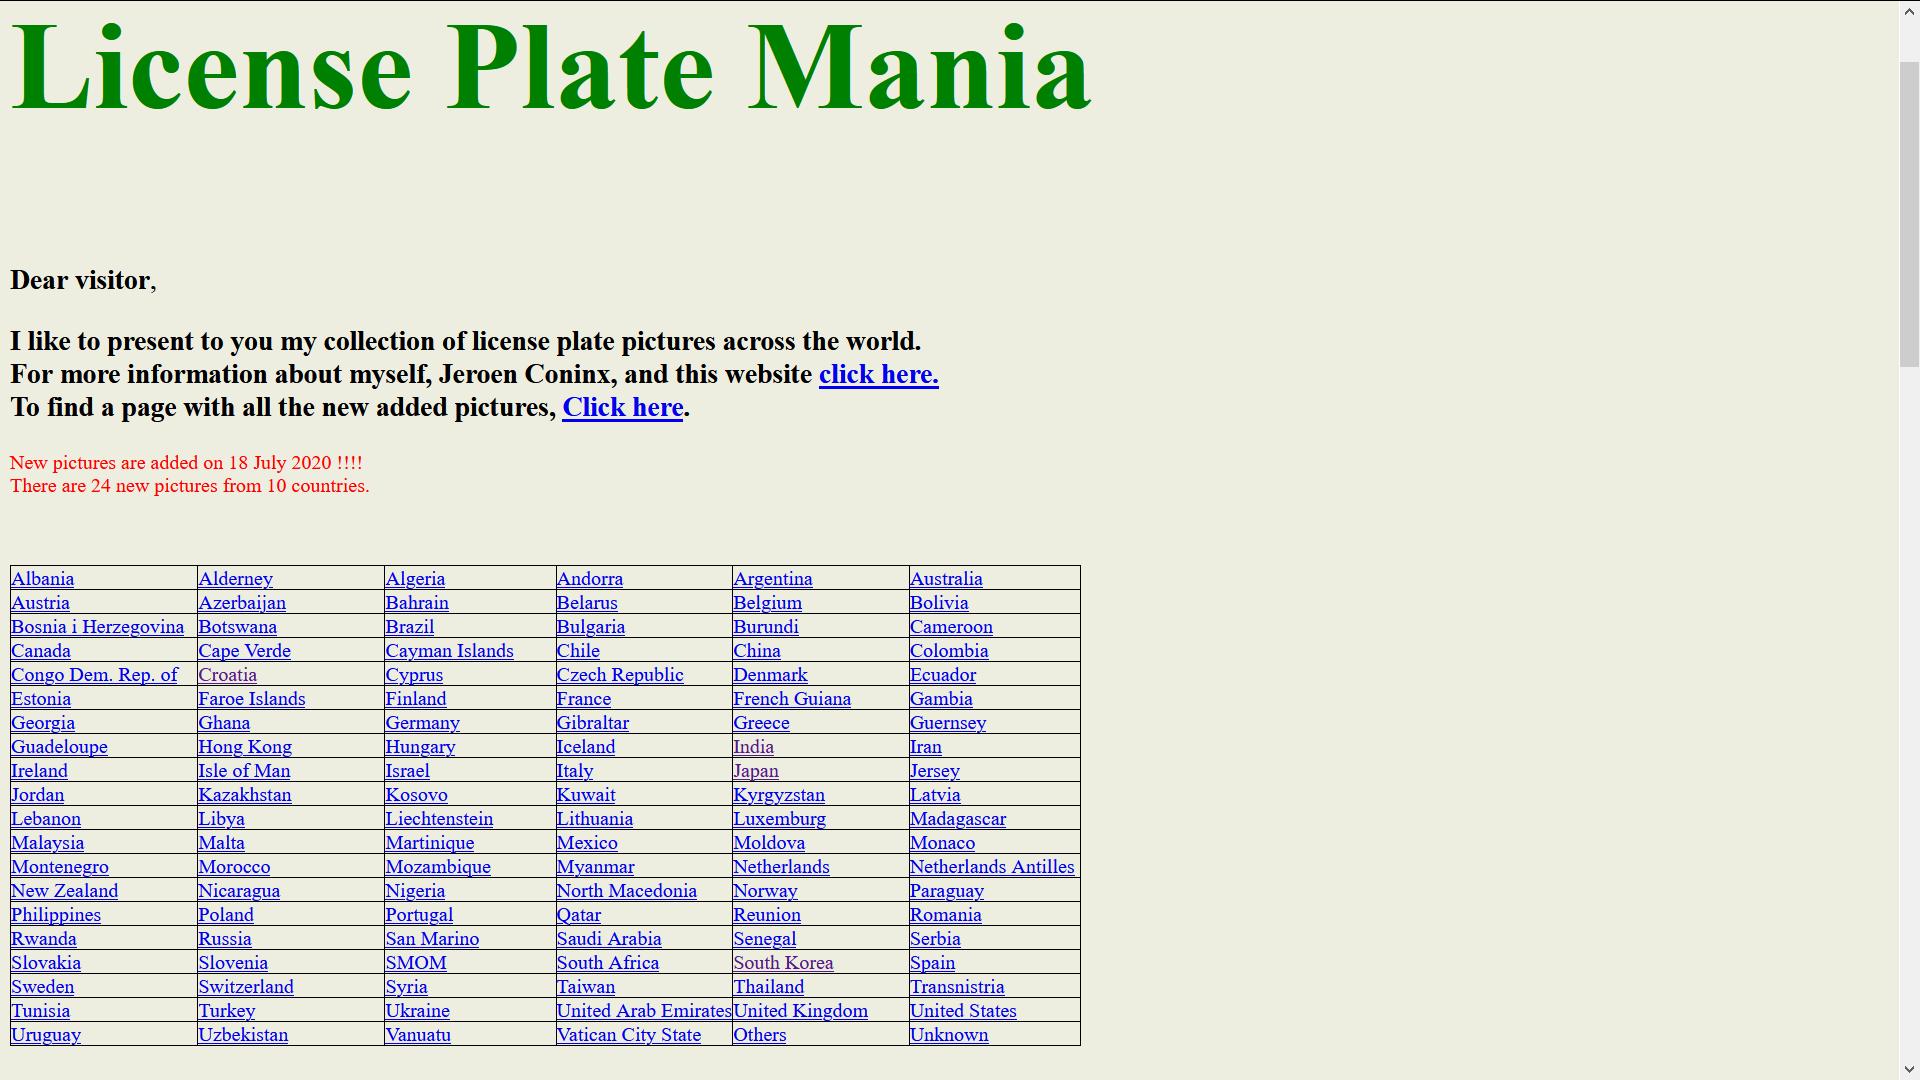 Licenseplatemania-investigative-journalism-tool